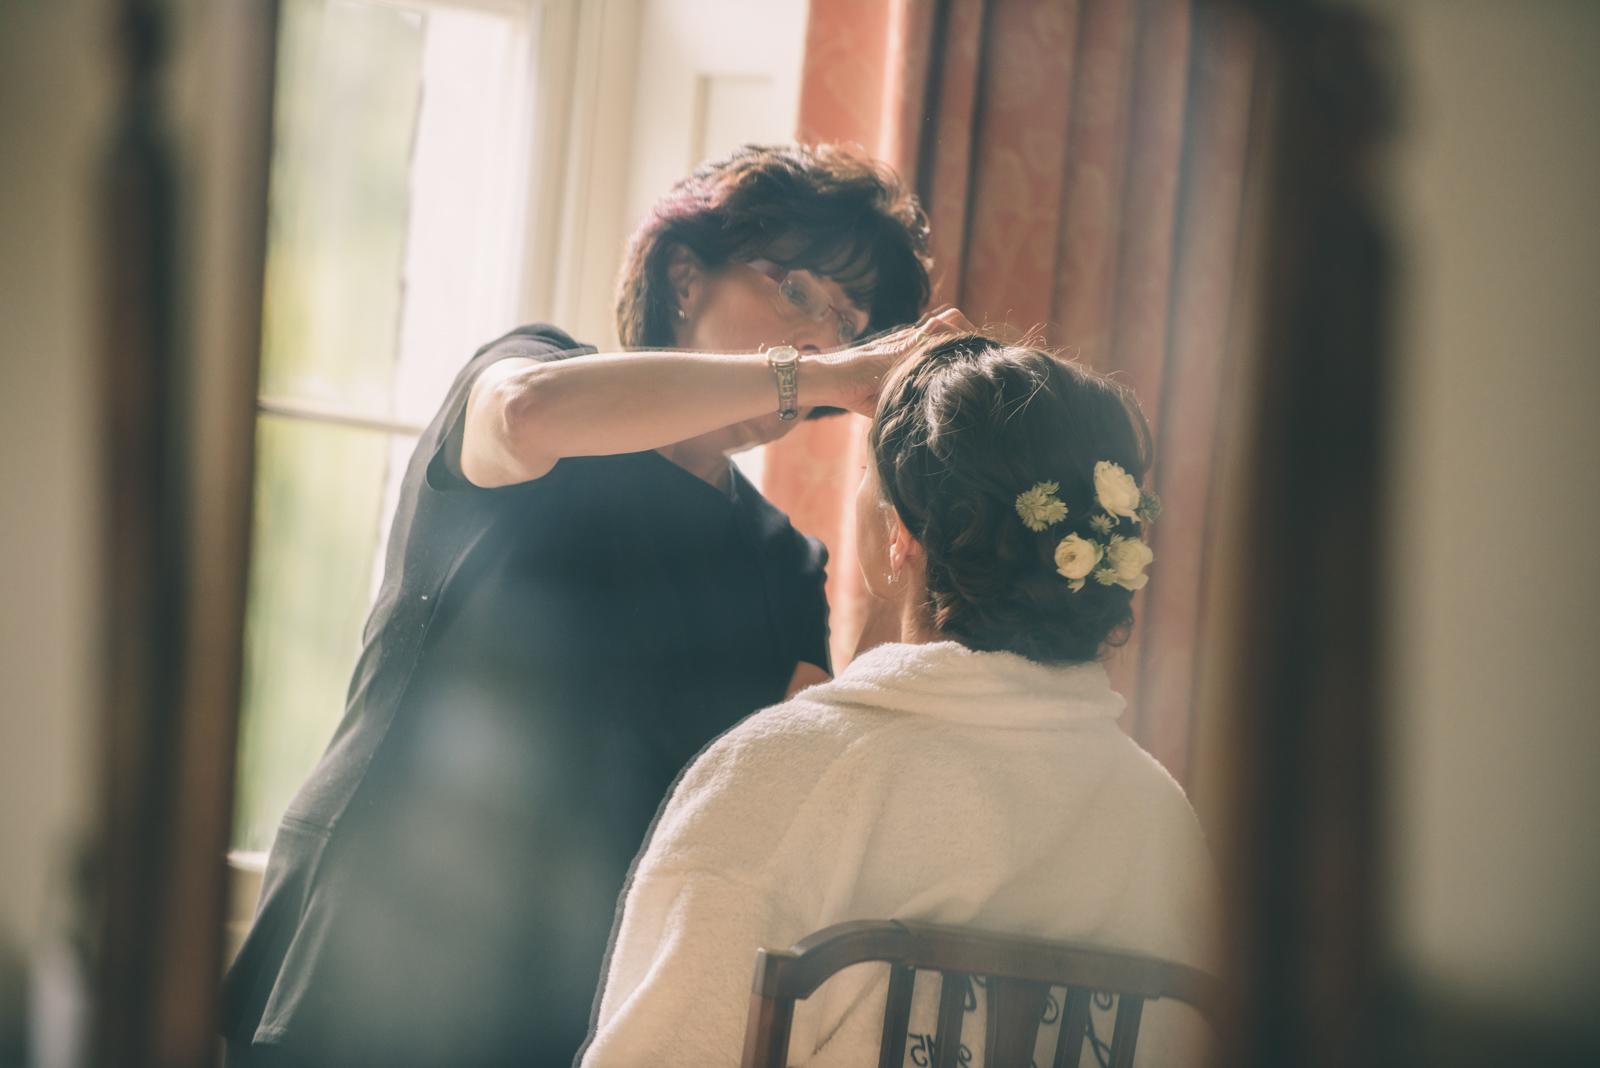 the-vean-wedding-photography-44.jpg